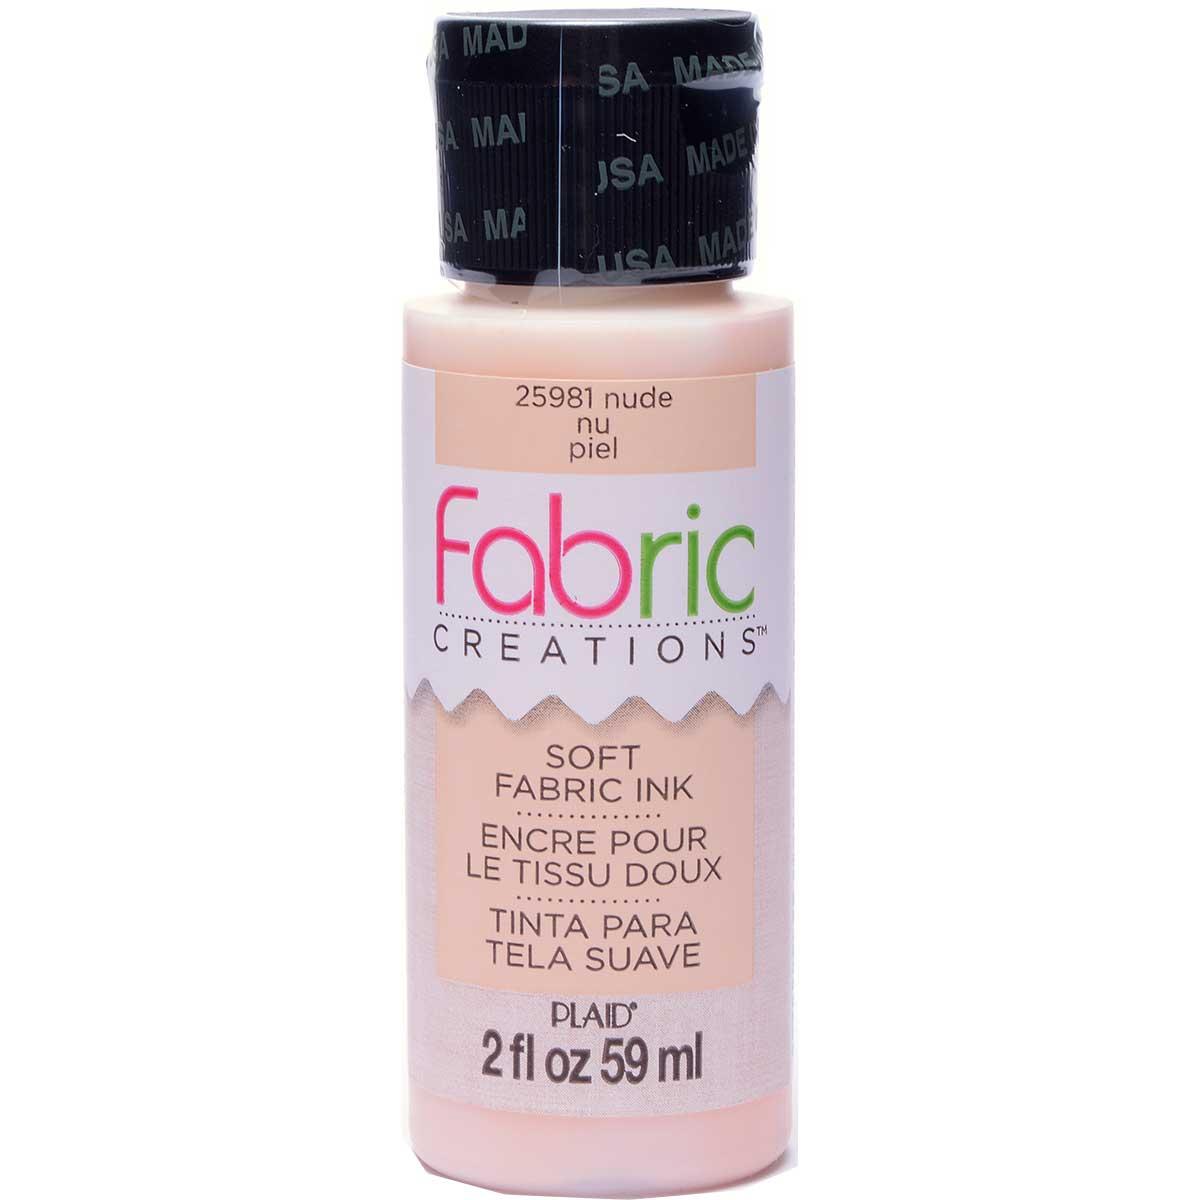 Fabric Creations™ Soft Fabric Inks - Nude, 2 oz. - 25981